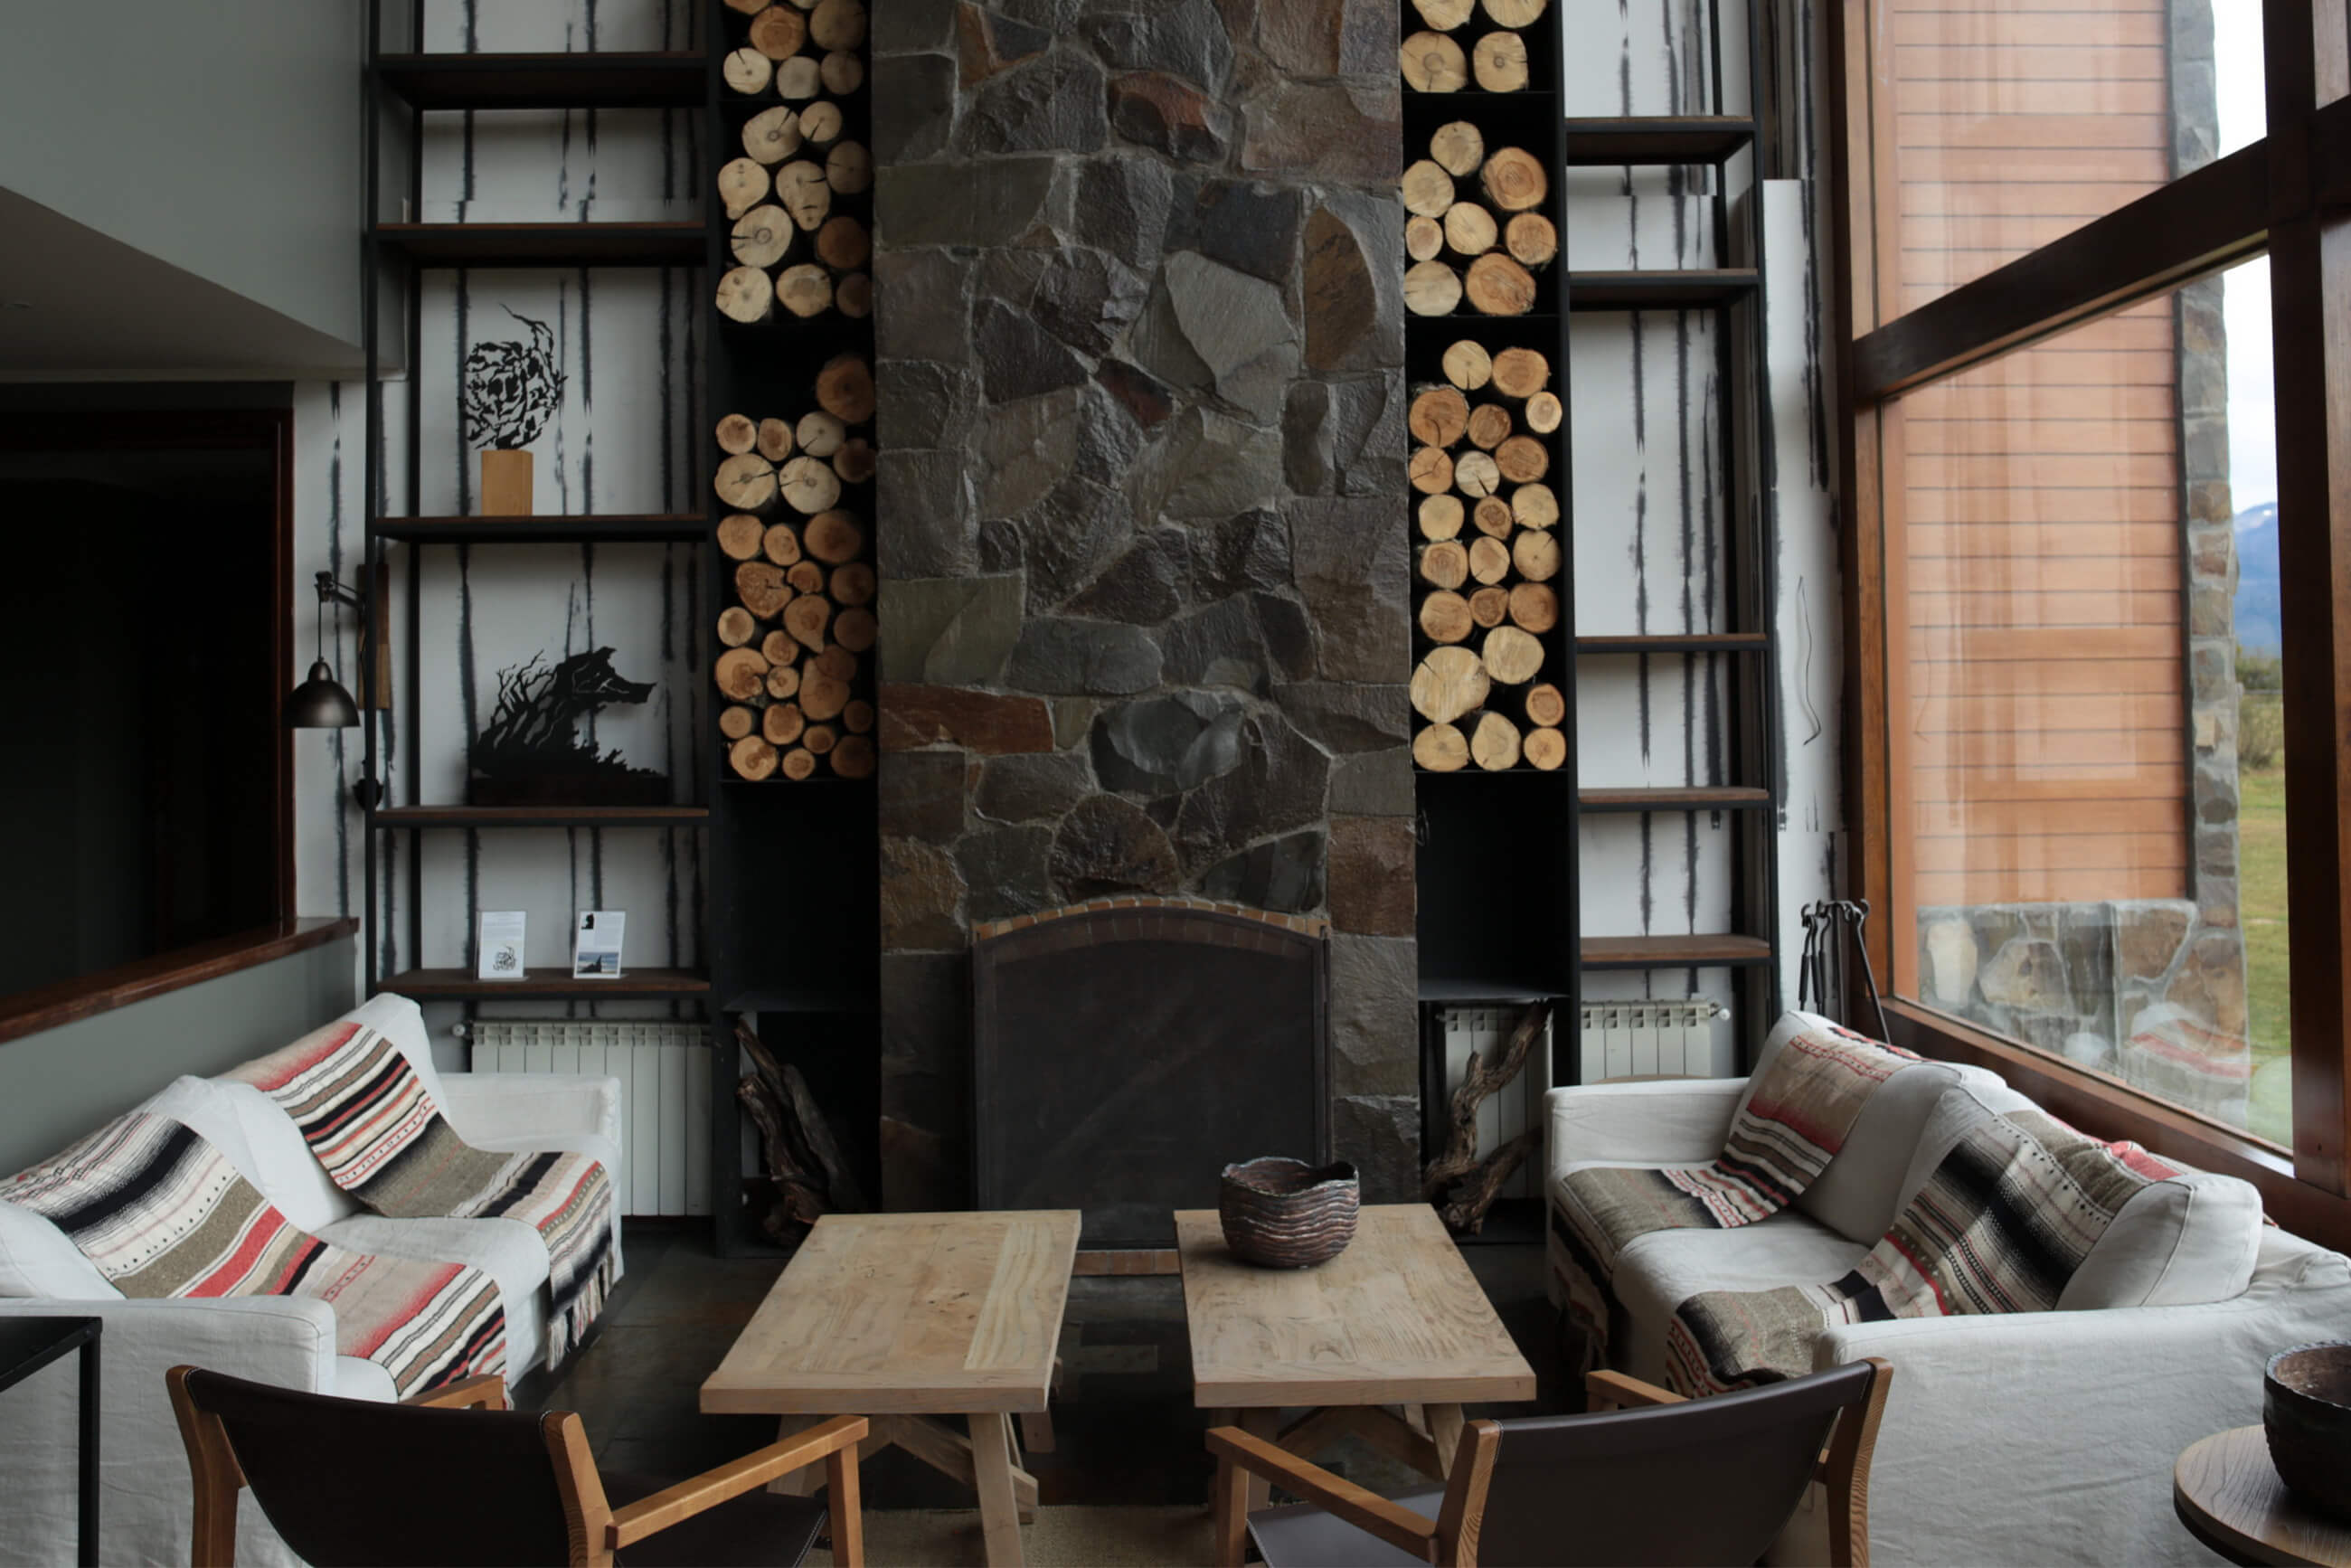 https://bubo.sk/uploads/galleries/5017/hotel_serrano_img_9619.jpg